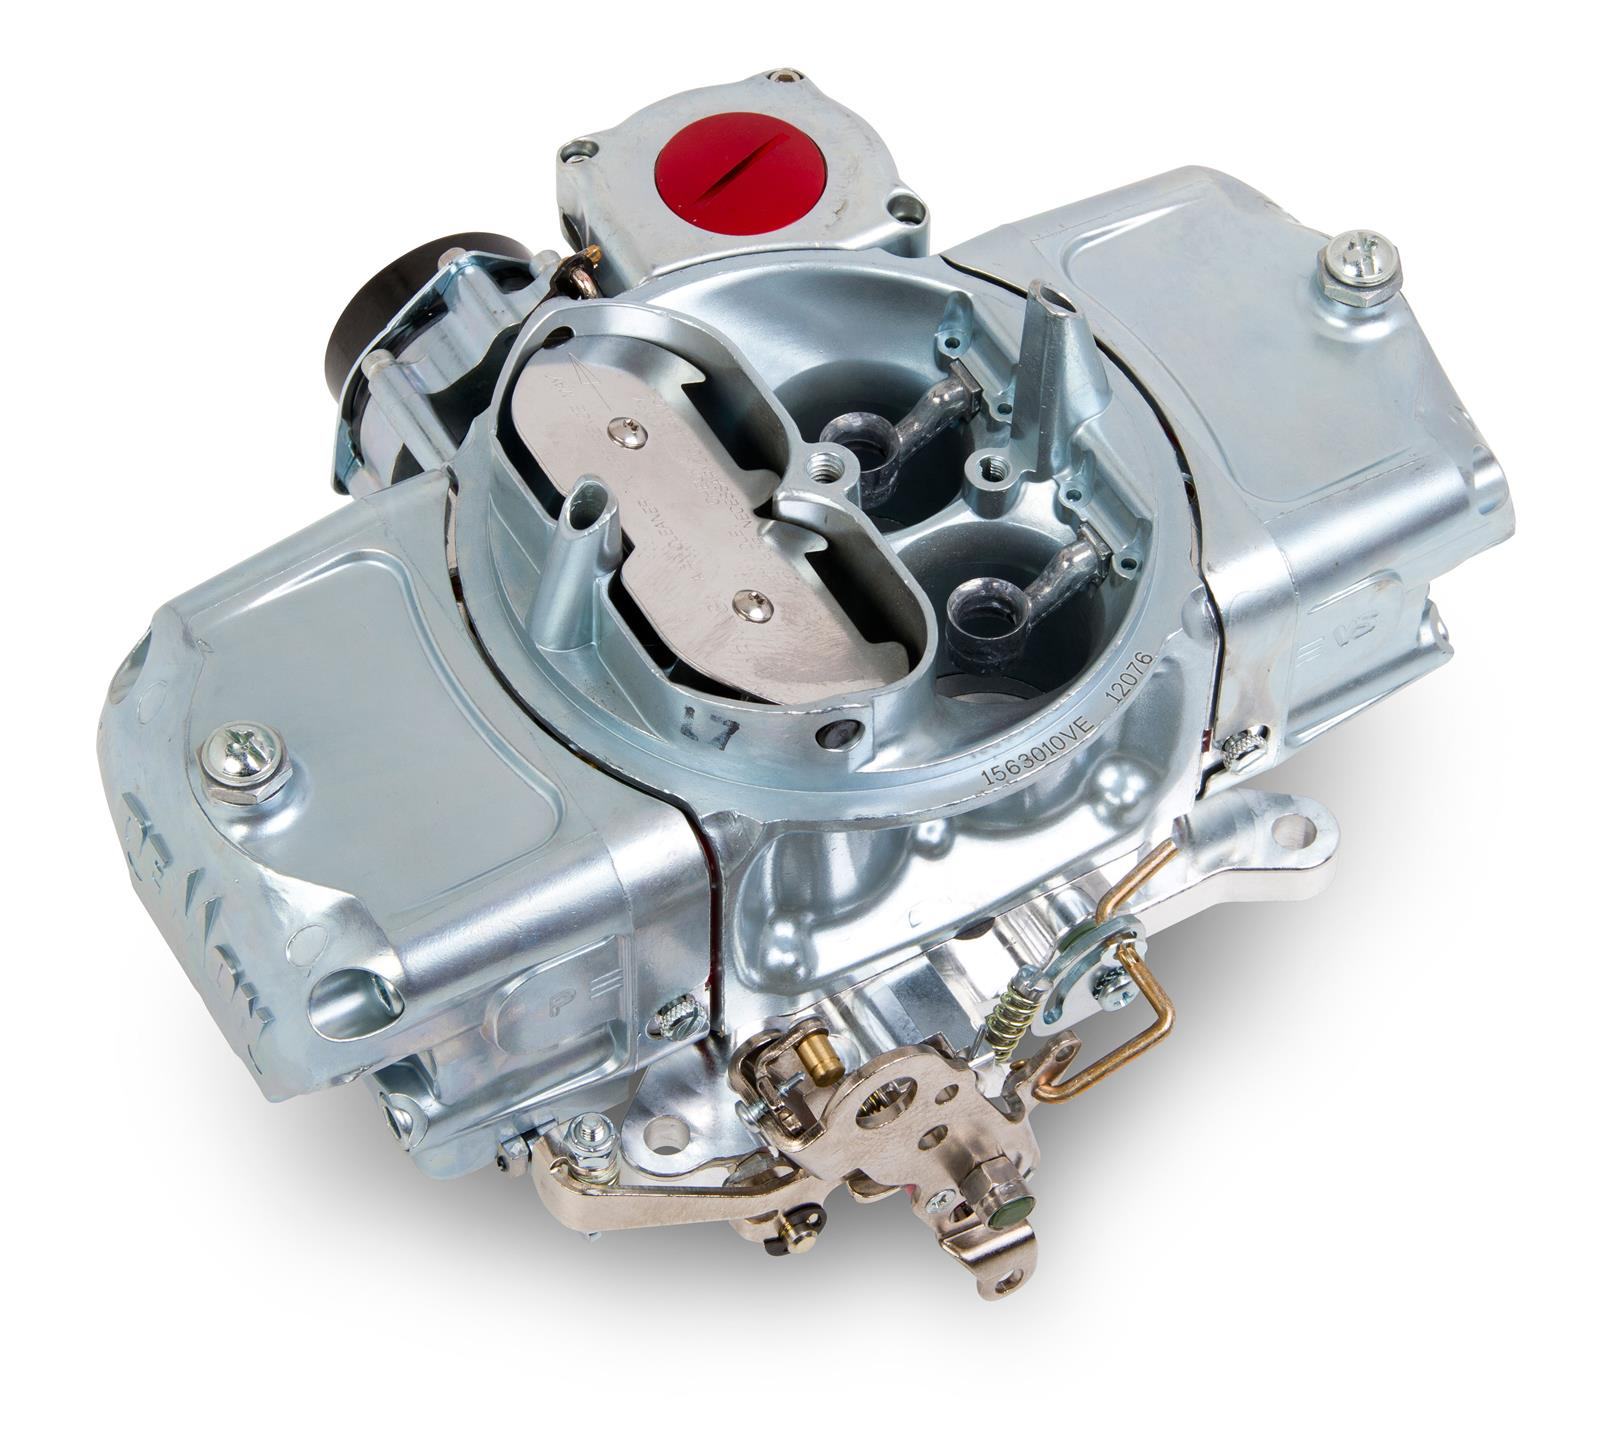 Holley 650 carburetor hook up. Issue-trends.ga